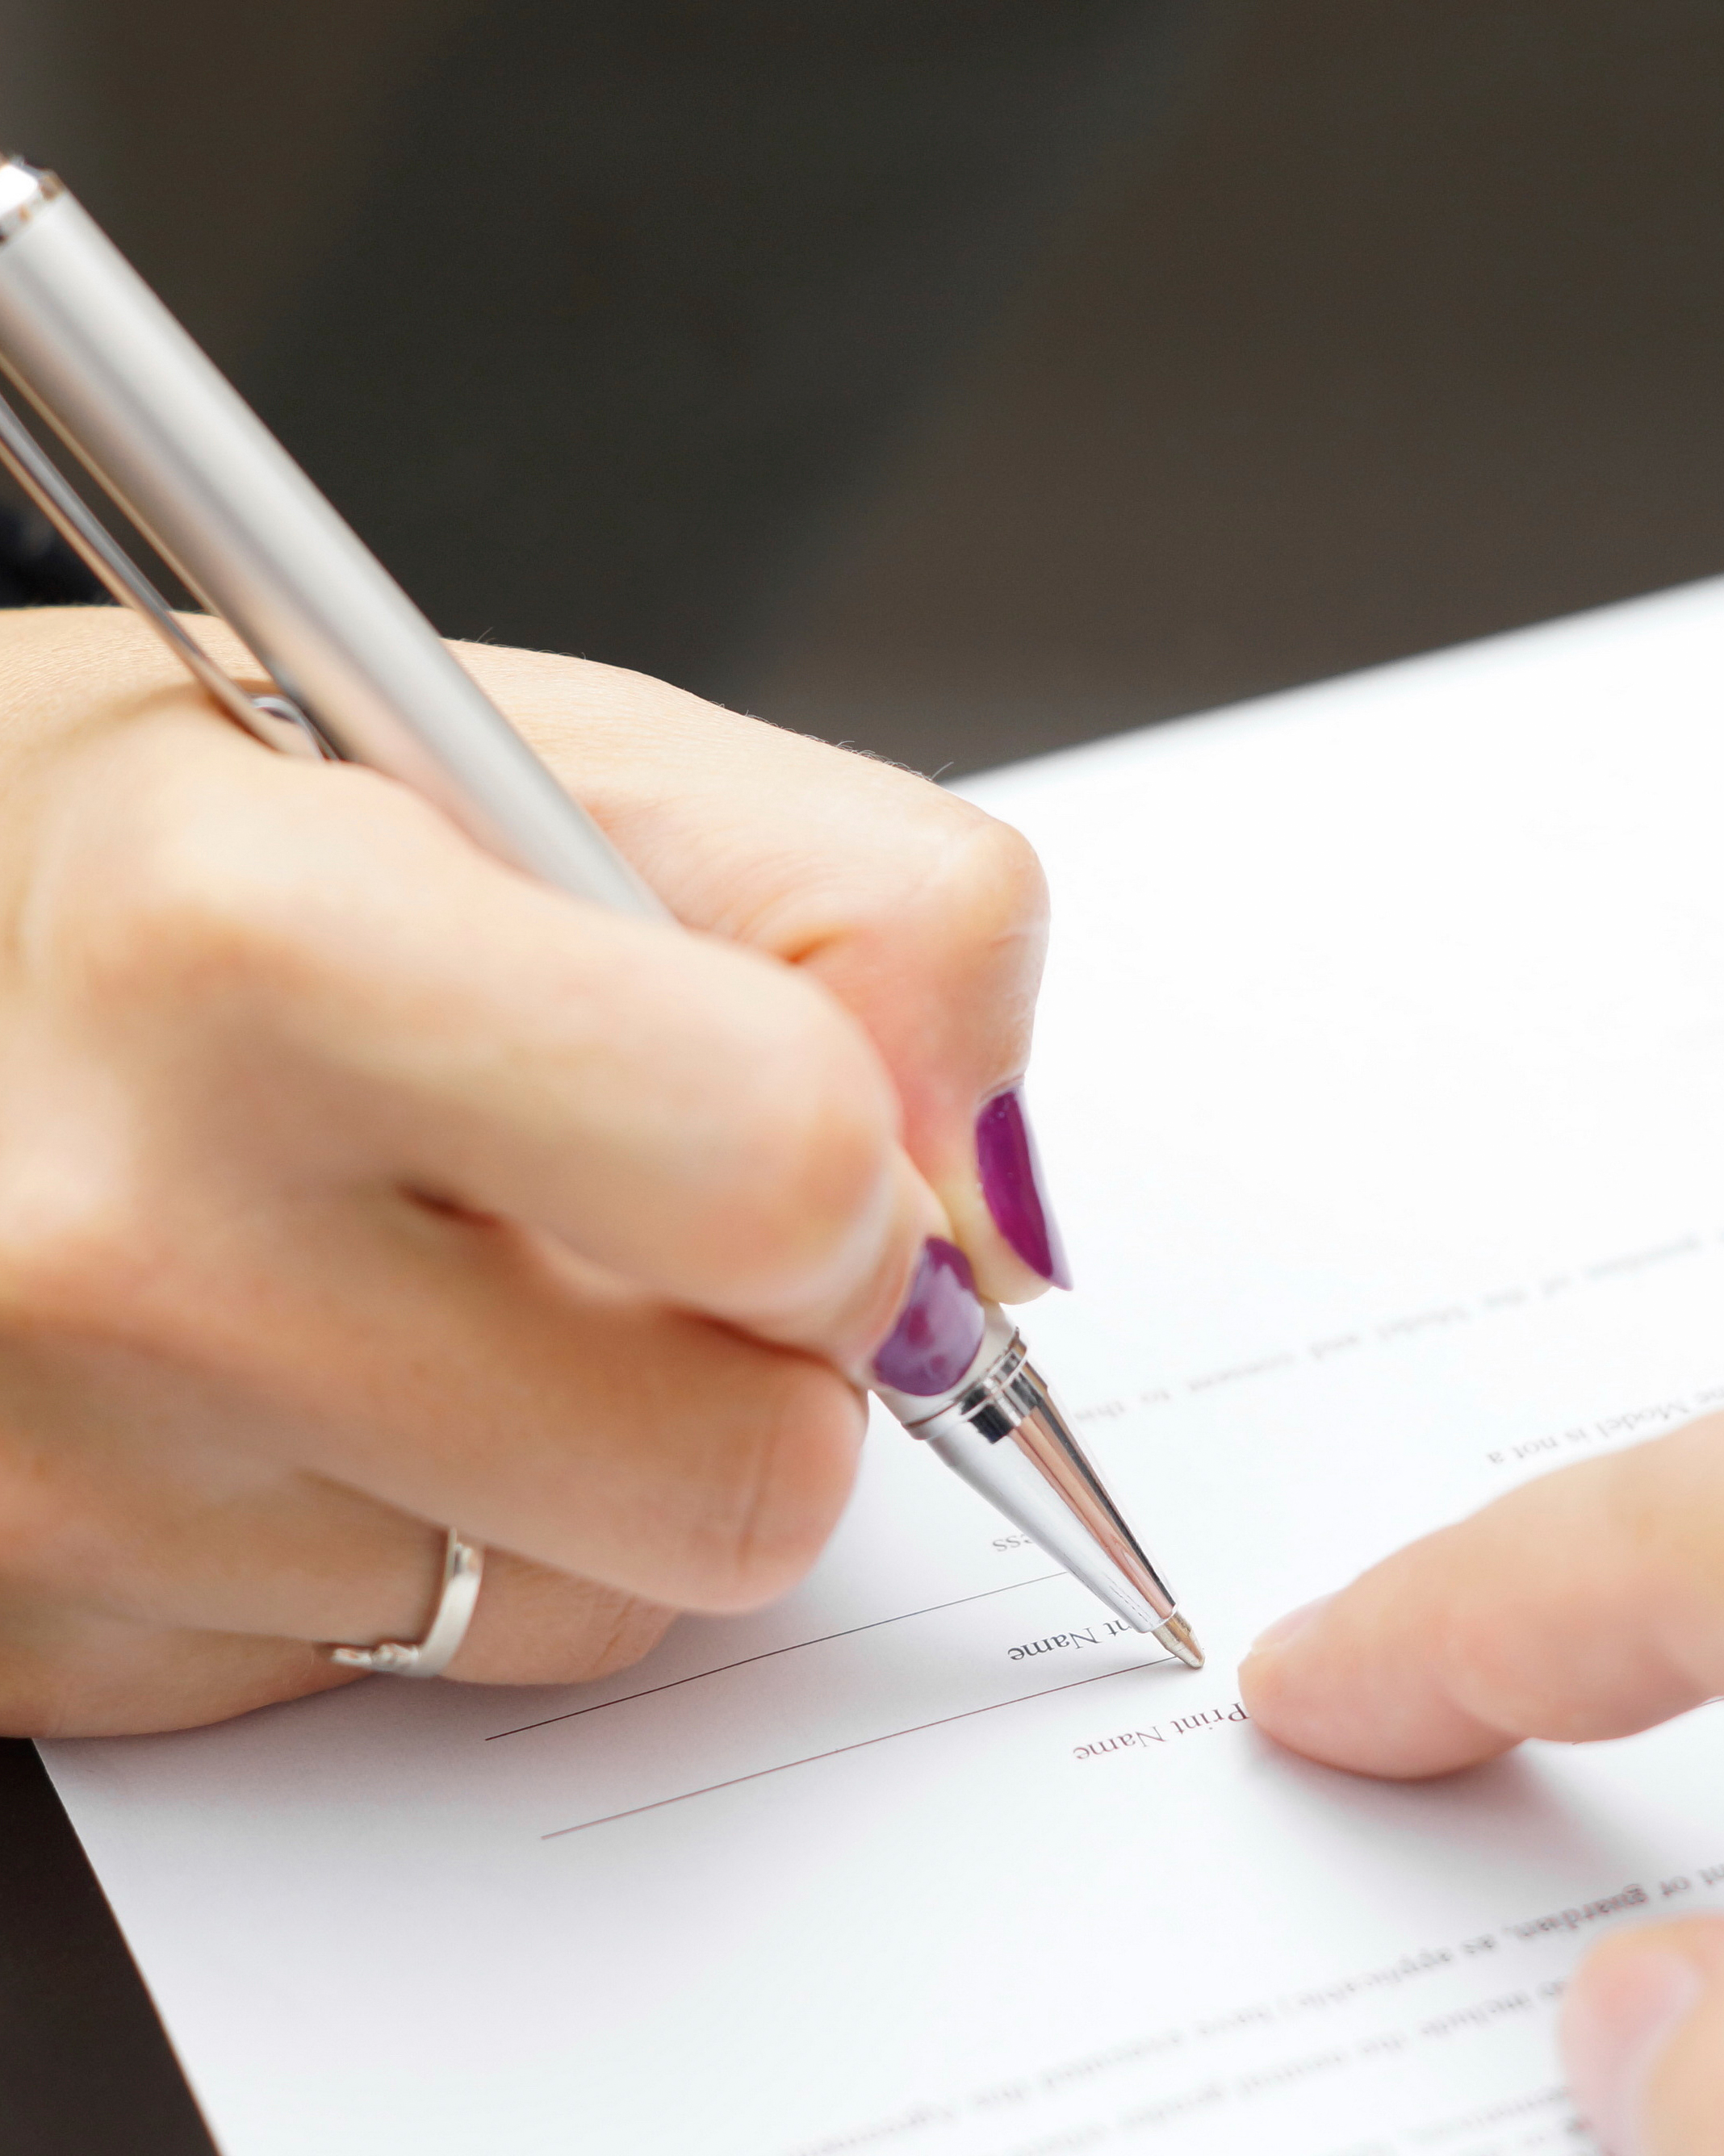 wedding-prenuptial-agreement-signing-document-1015.jpg